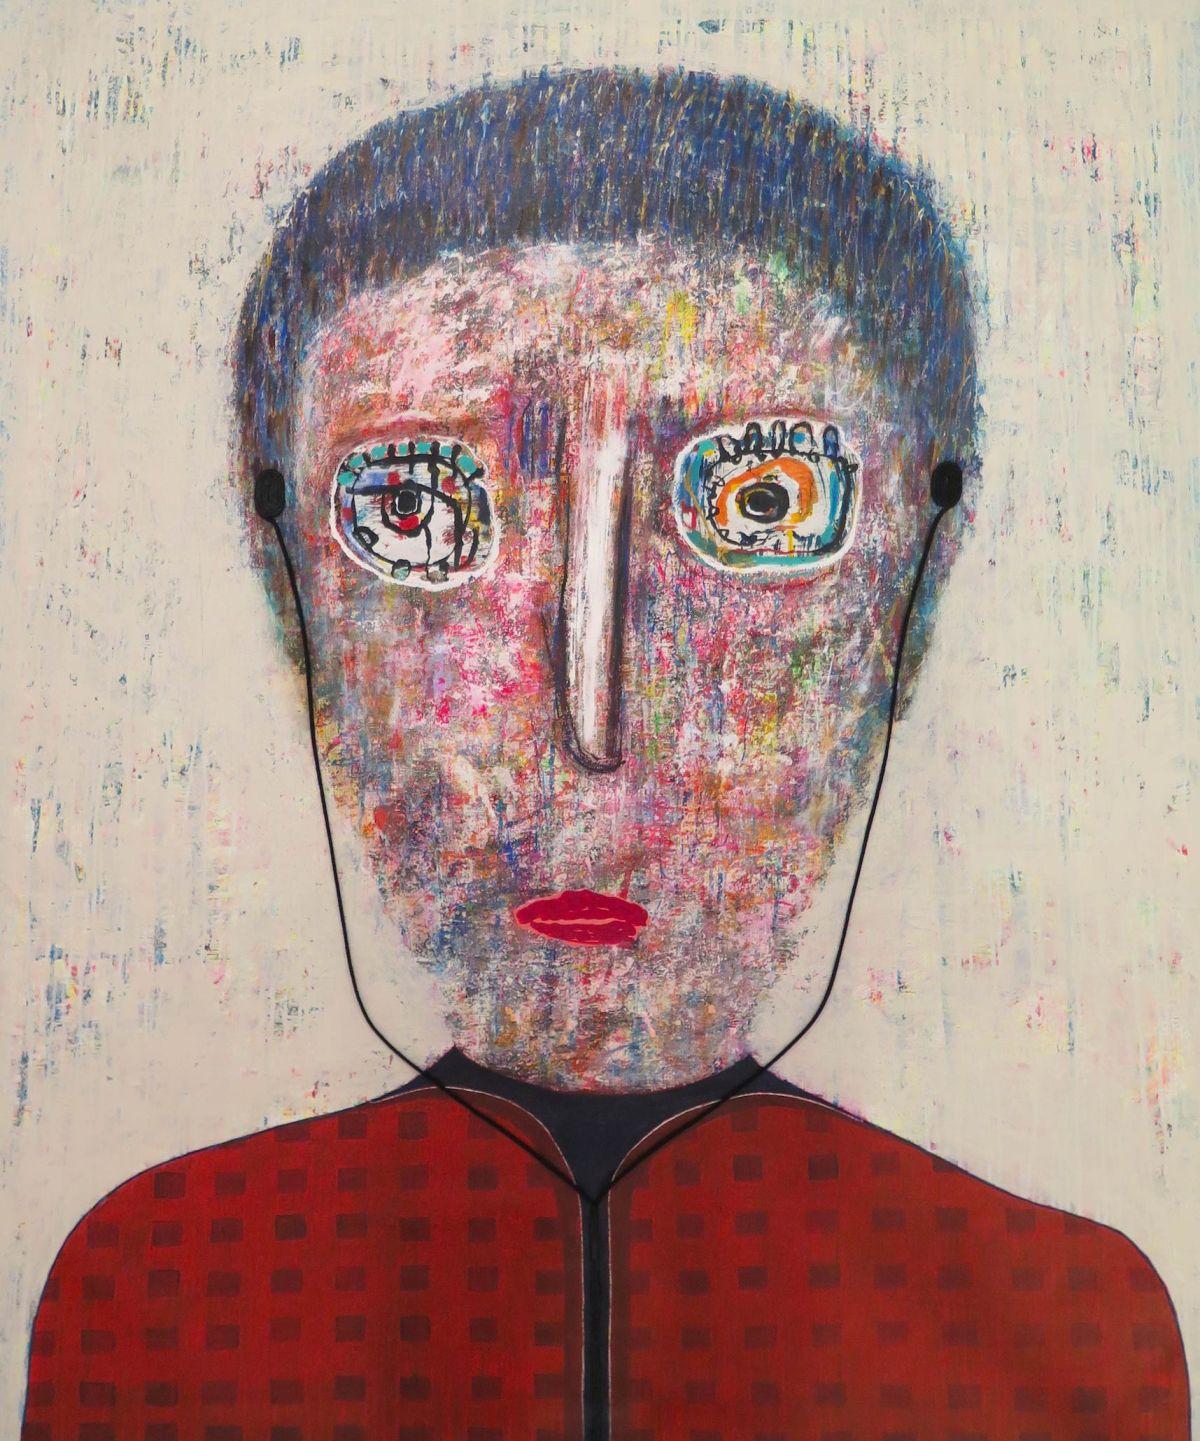 bryant-toth-fine-art-hector-frank-exhibition-3